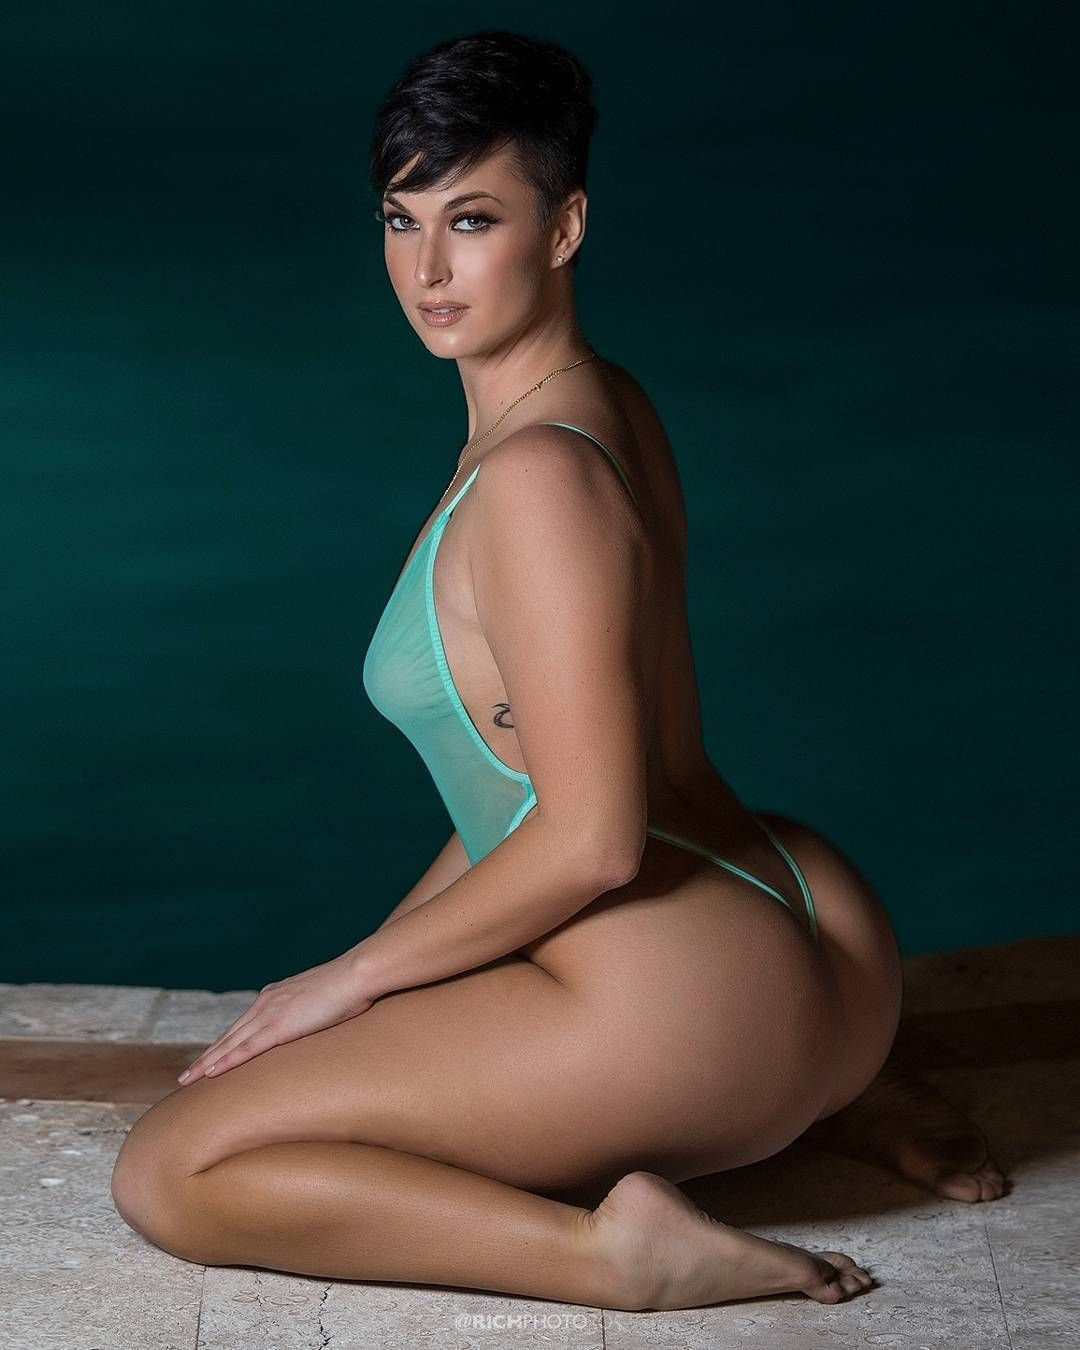 Sexy yanks girl zahra stardust masturbating 5